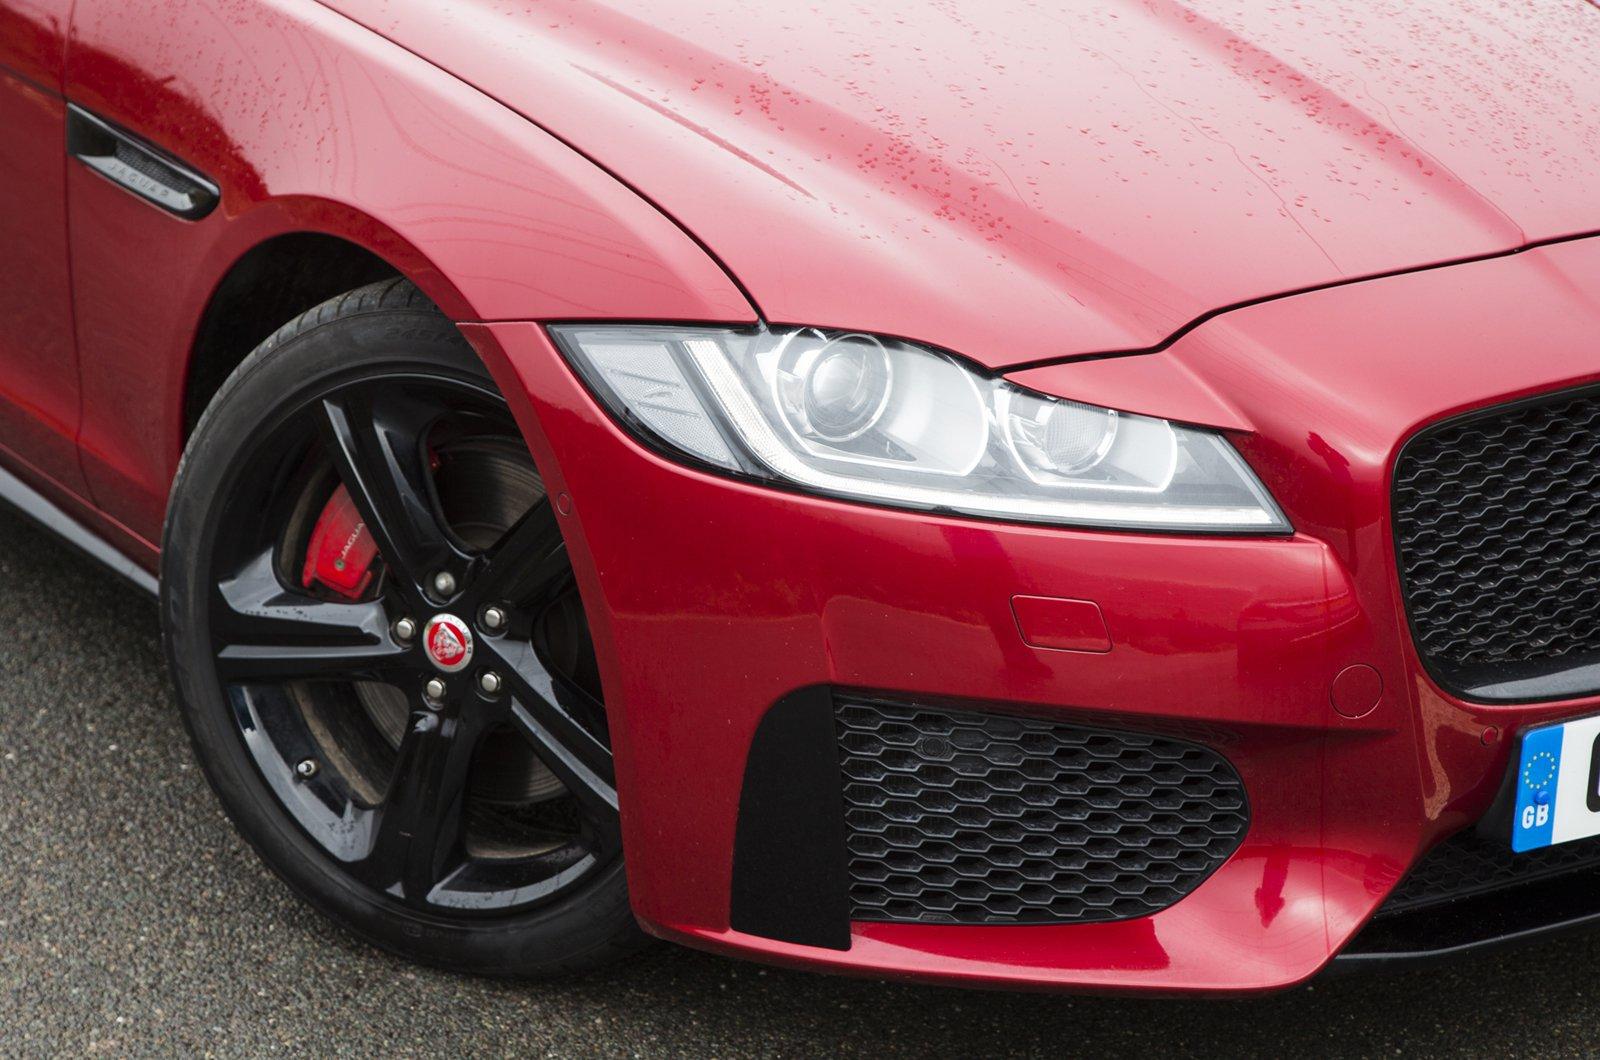 Jaguar XF alloy wheel and headlight